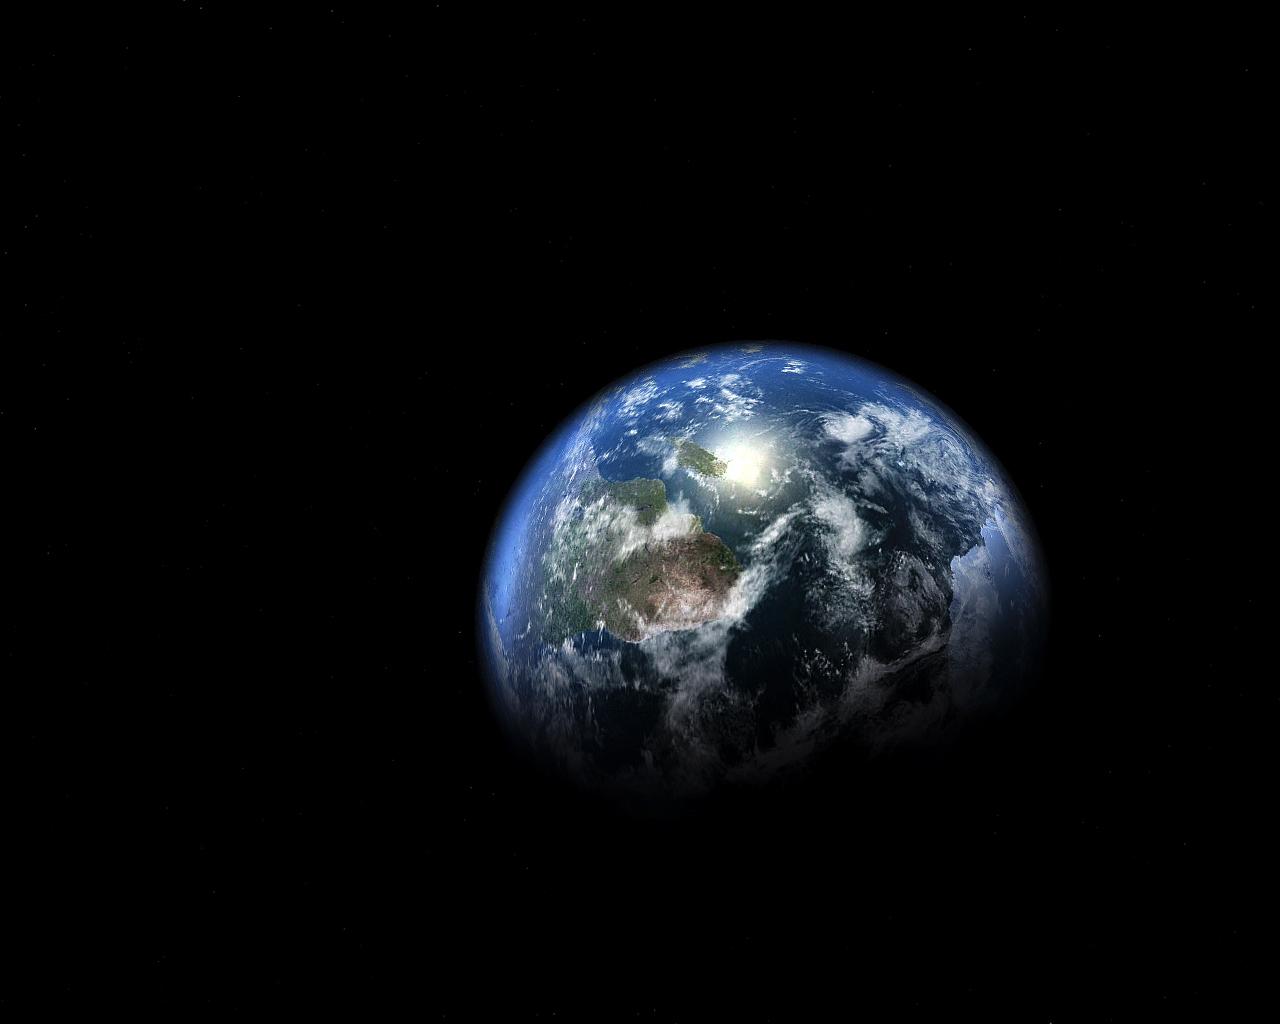 http://1.bp.blogspot.com/-tDP9Ys9IIaw/ULPHEhtfJlI/AAAAAAAAAEo/2DkkmYkbdwk/s1600/planeta-tierra.jpg